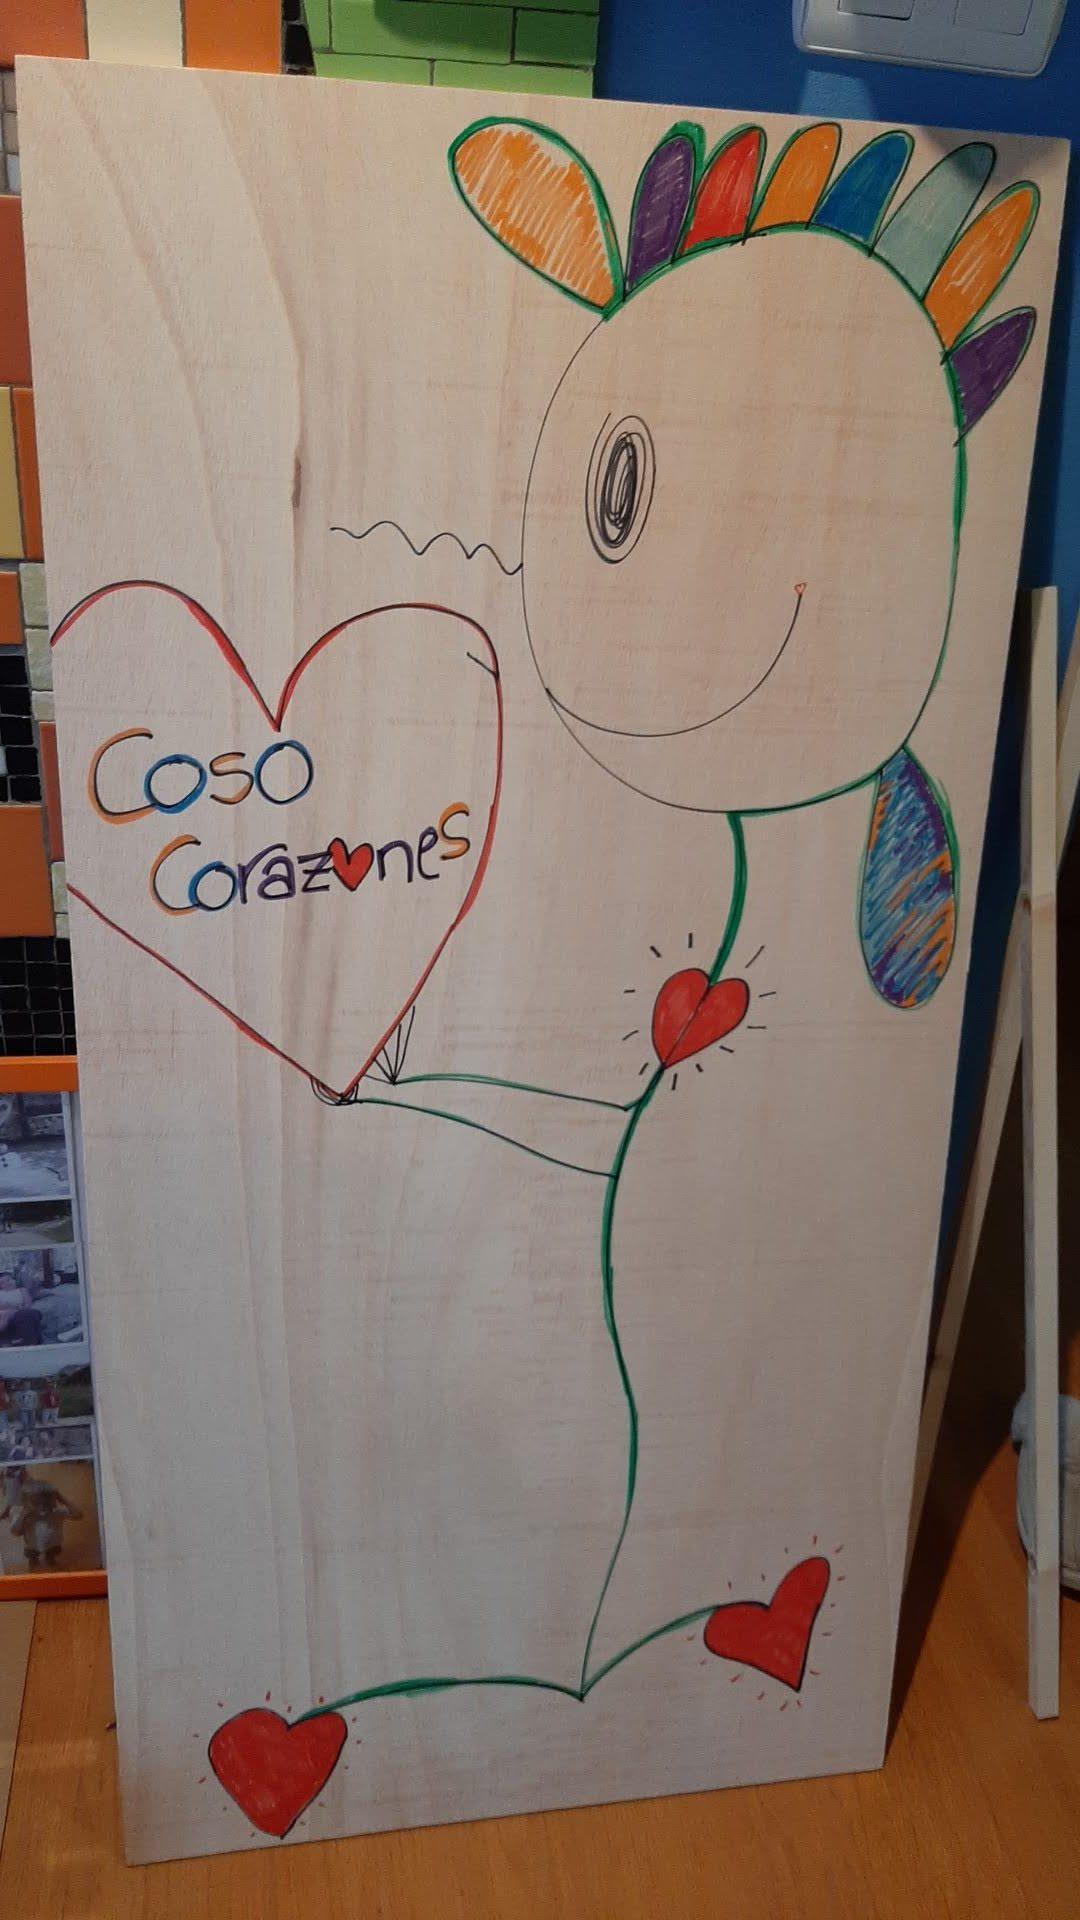 Tablero Coso Corazones